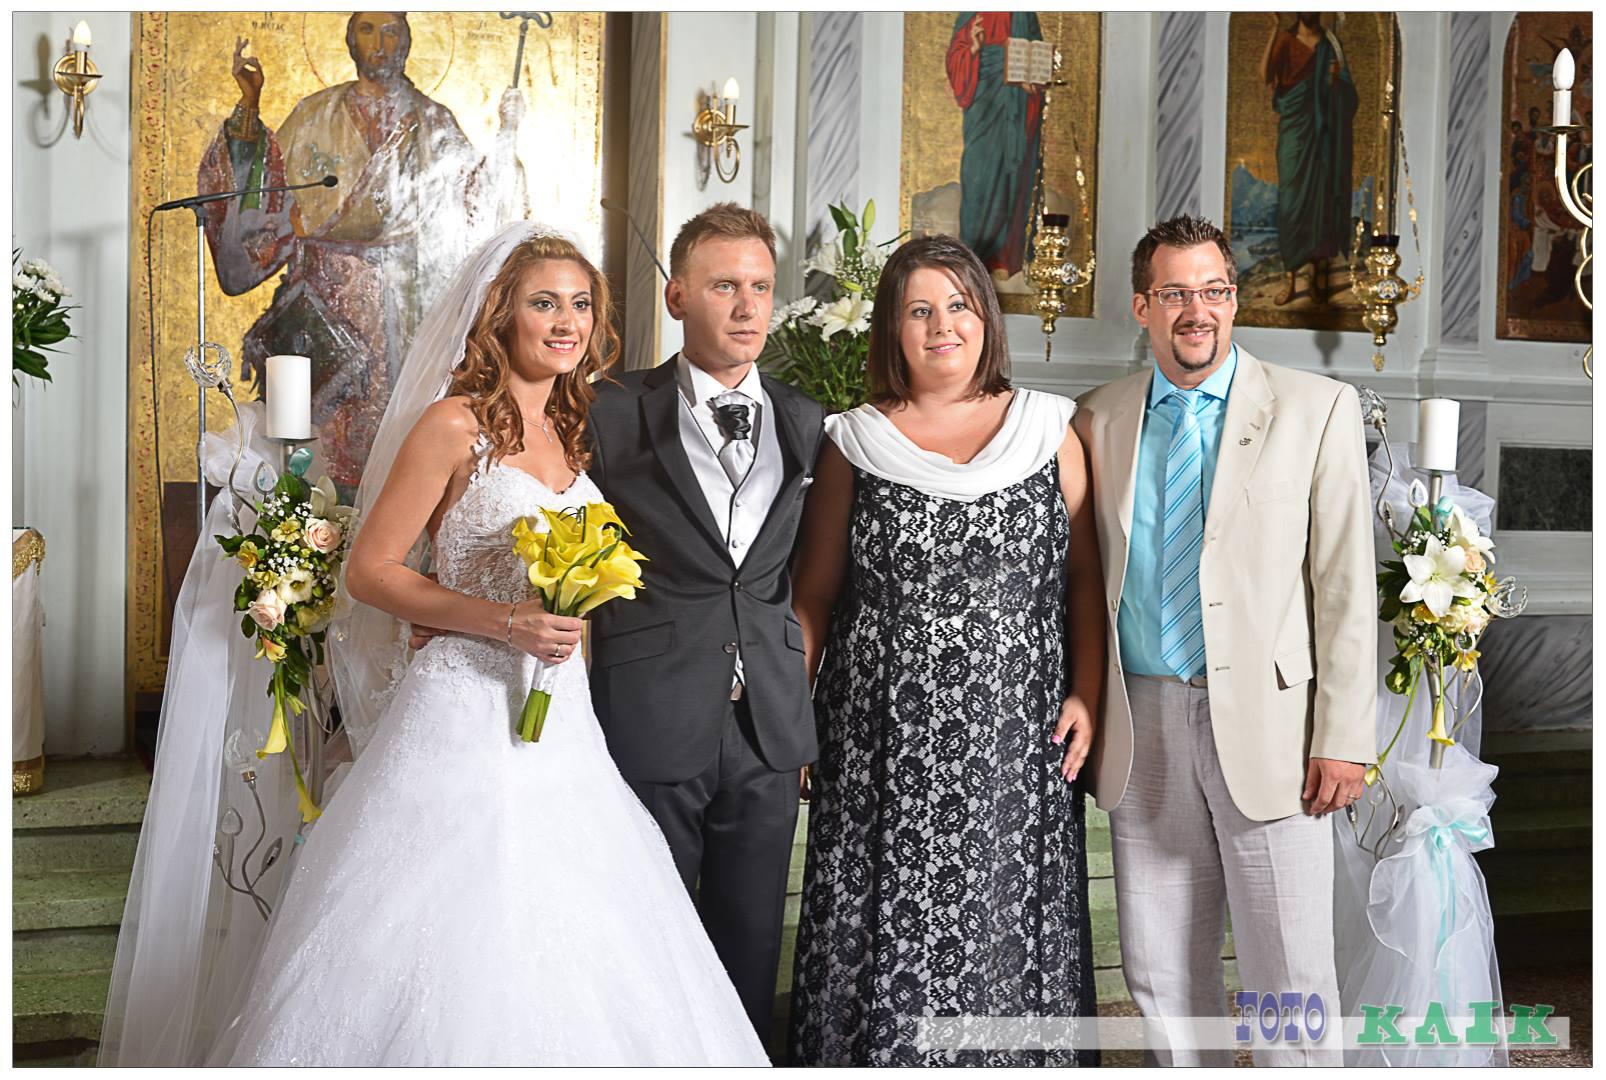 0a219661bd3d Ένας απόλυτα ρομαντικός φθινοπωρινός γάμος για τη Γεωργία και τον ...